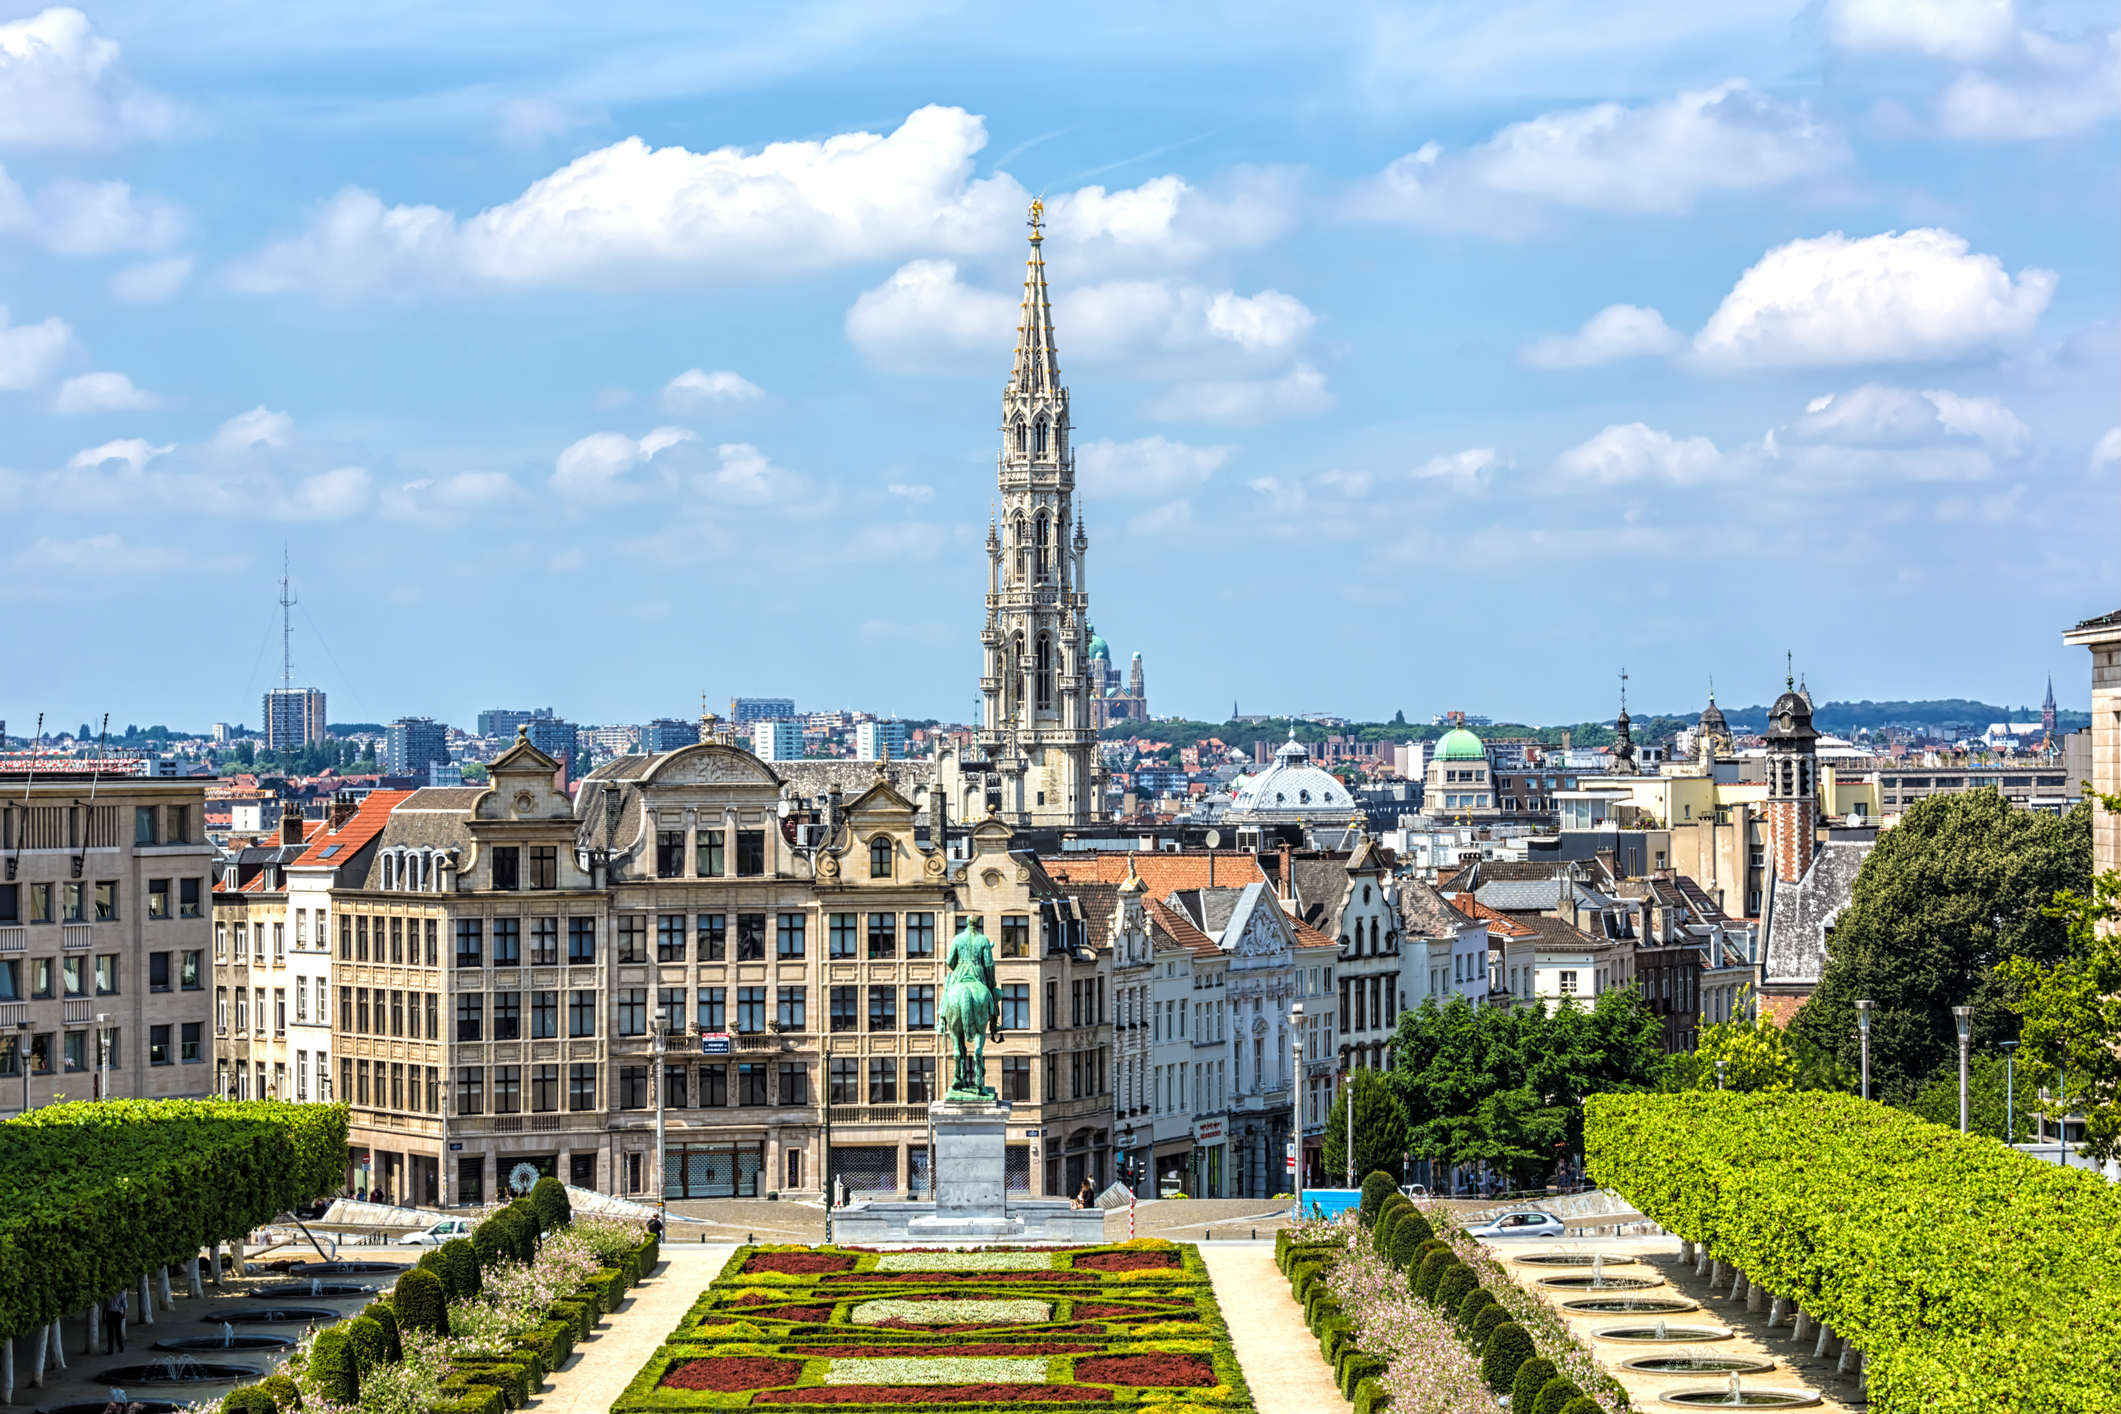 Una piacevole vista di Bruxelles